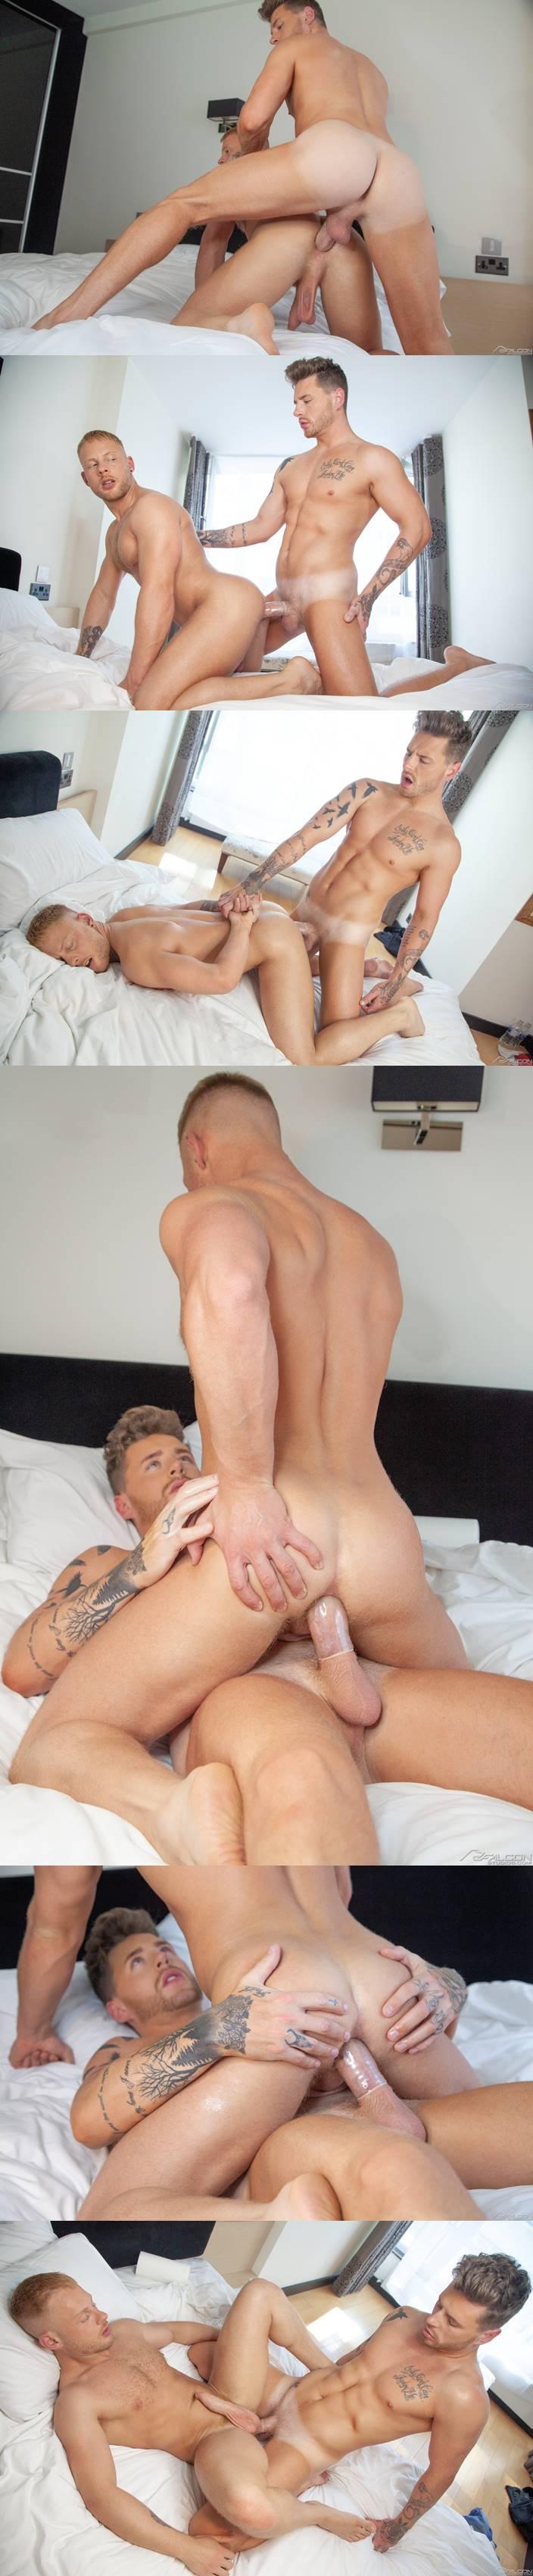 Josh Moore & Andro Maas - London Calling 1